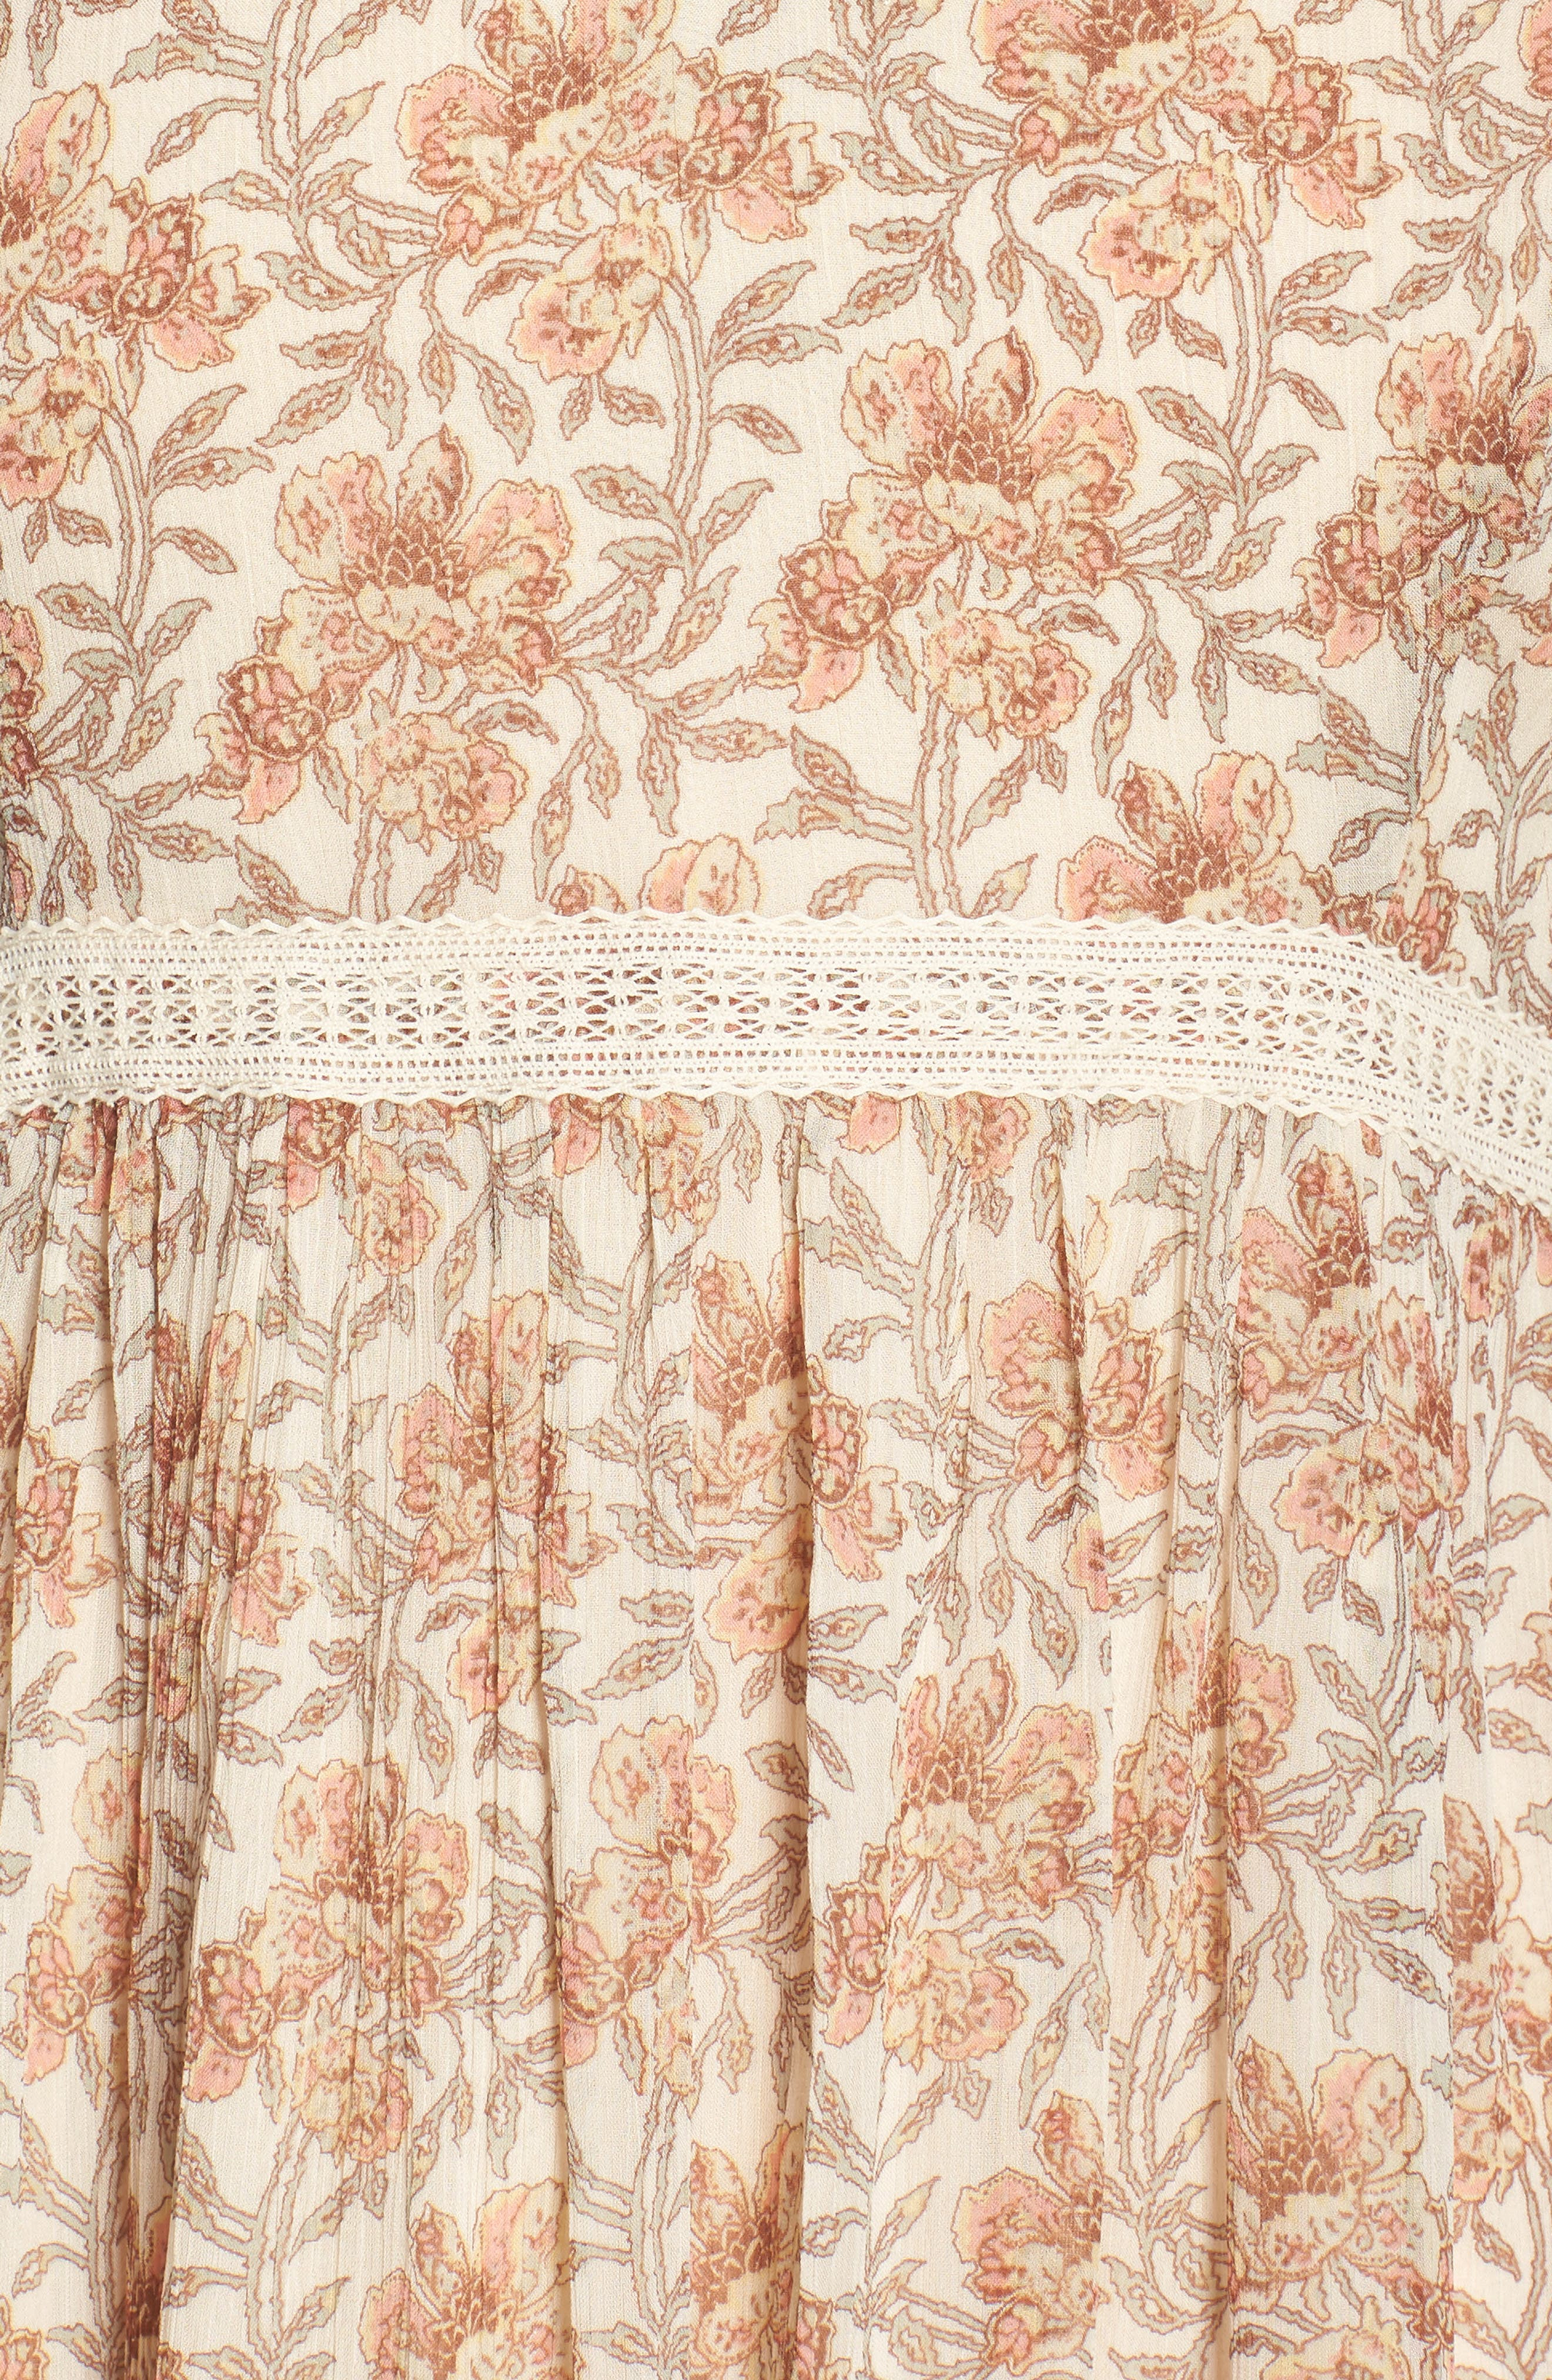 Aubrey Floral Print Dress,                             Alternate thumbnail 6, color,                             Desert Sunrise Floral